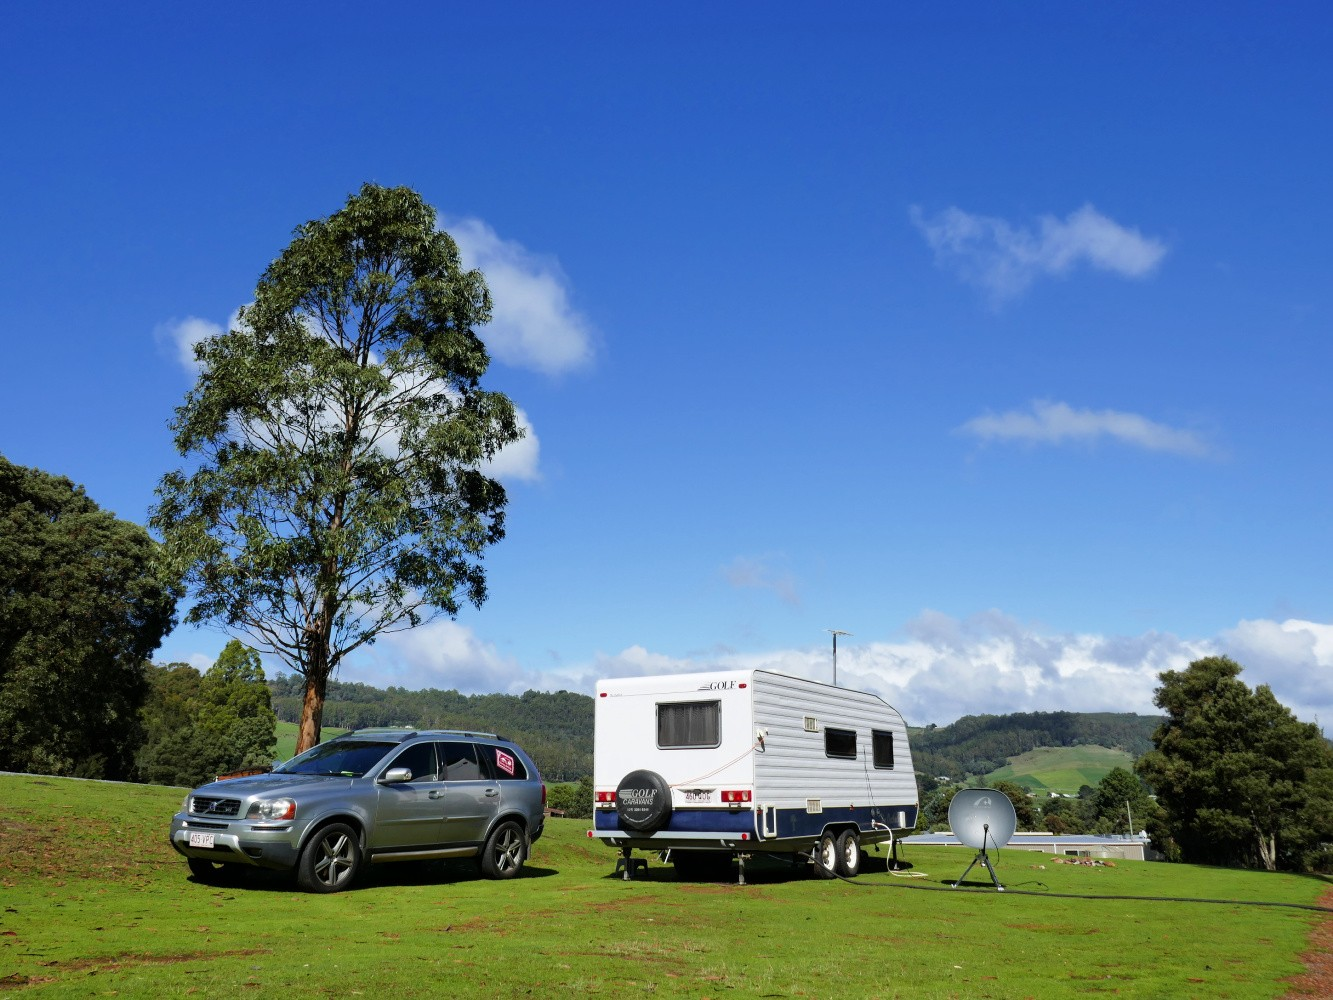 Caravan set in a grassy caravan park